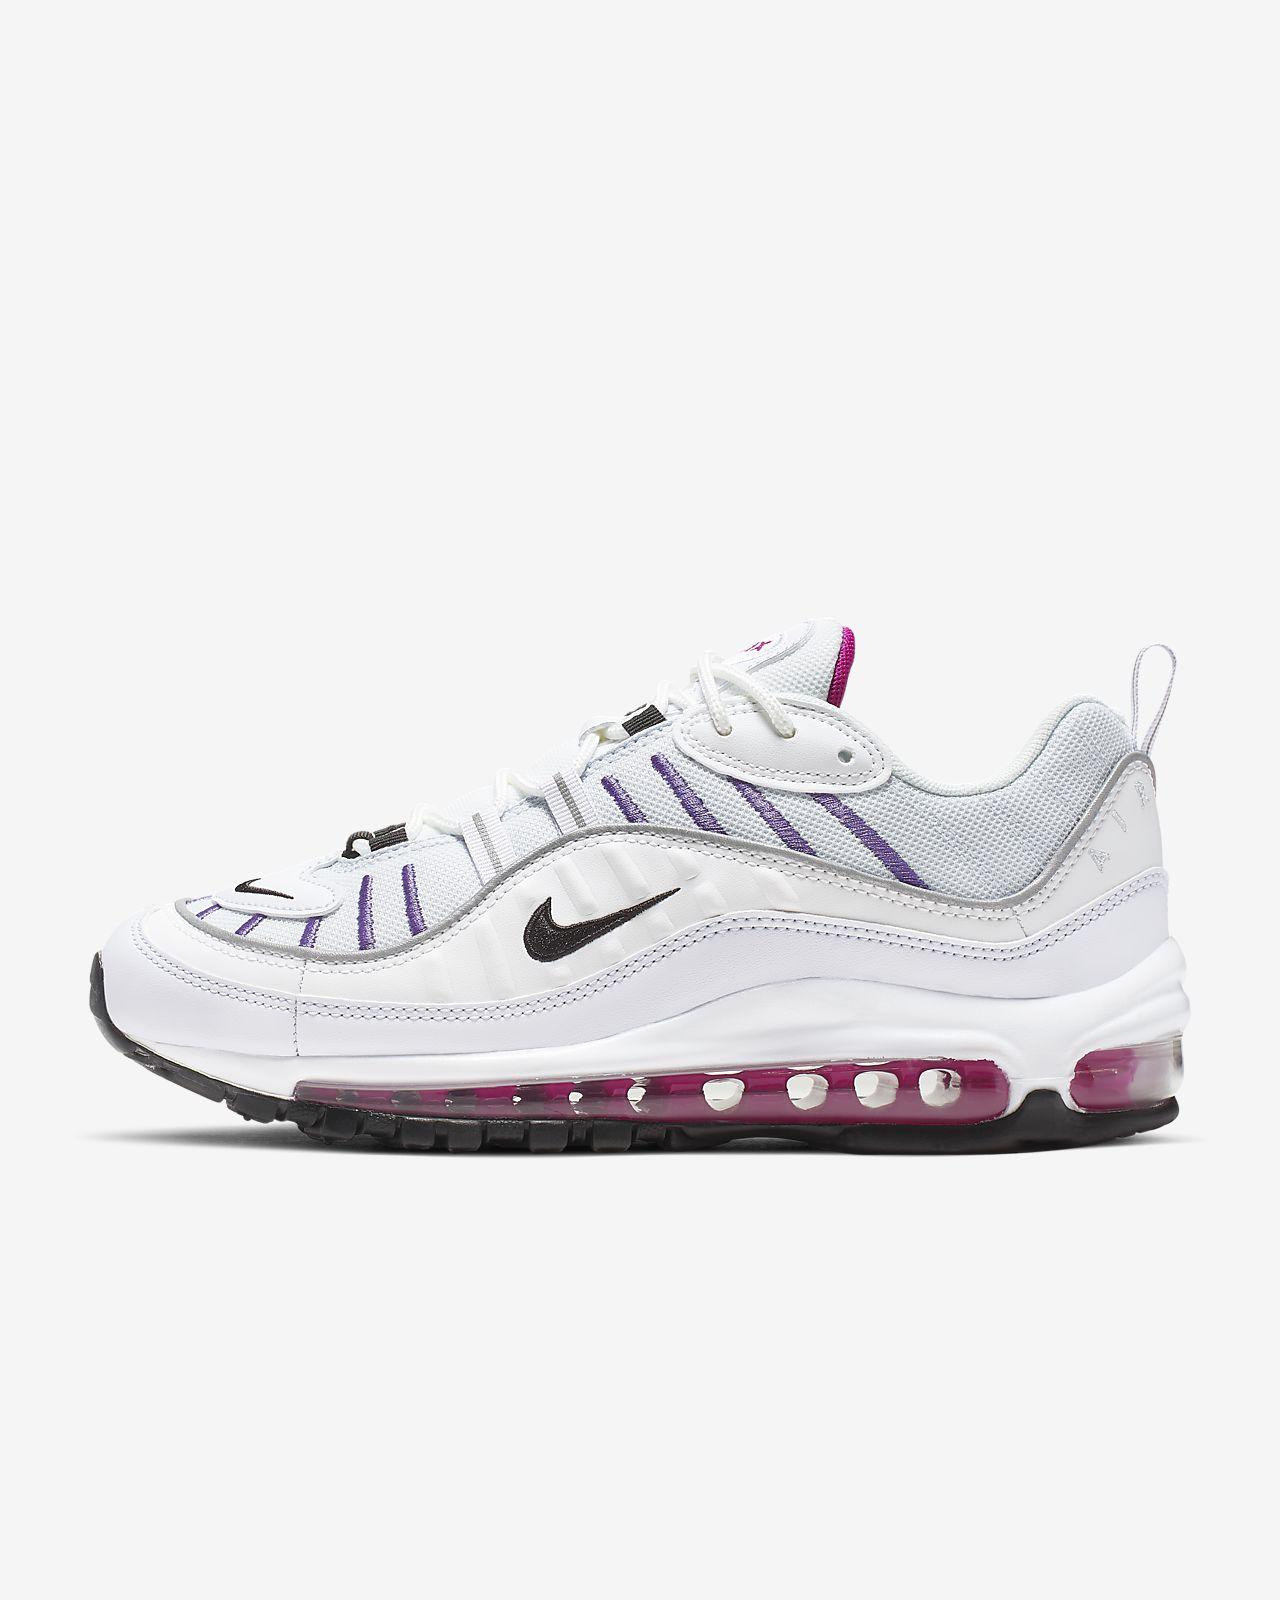 Sportschuhe Nike Air Max 98 Herren Sneaker Sale Online Günstig